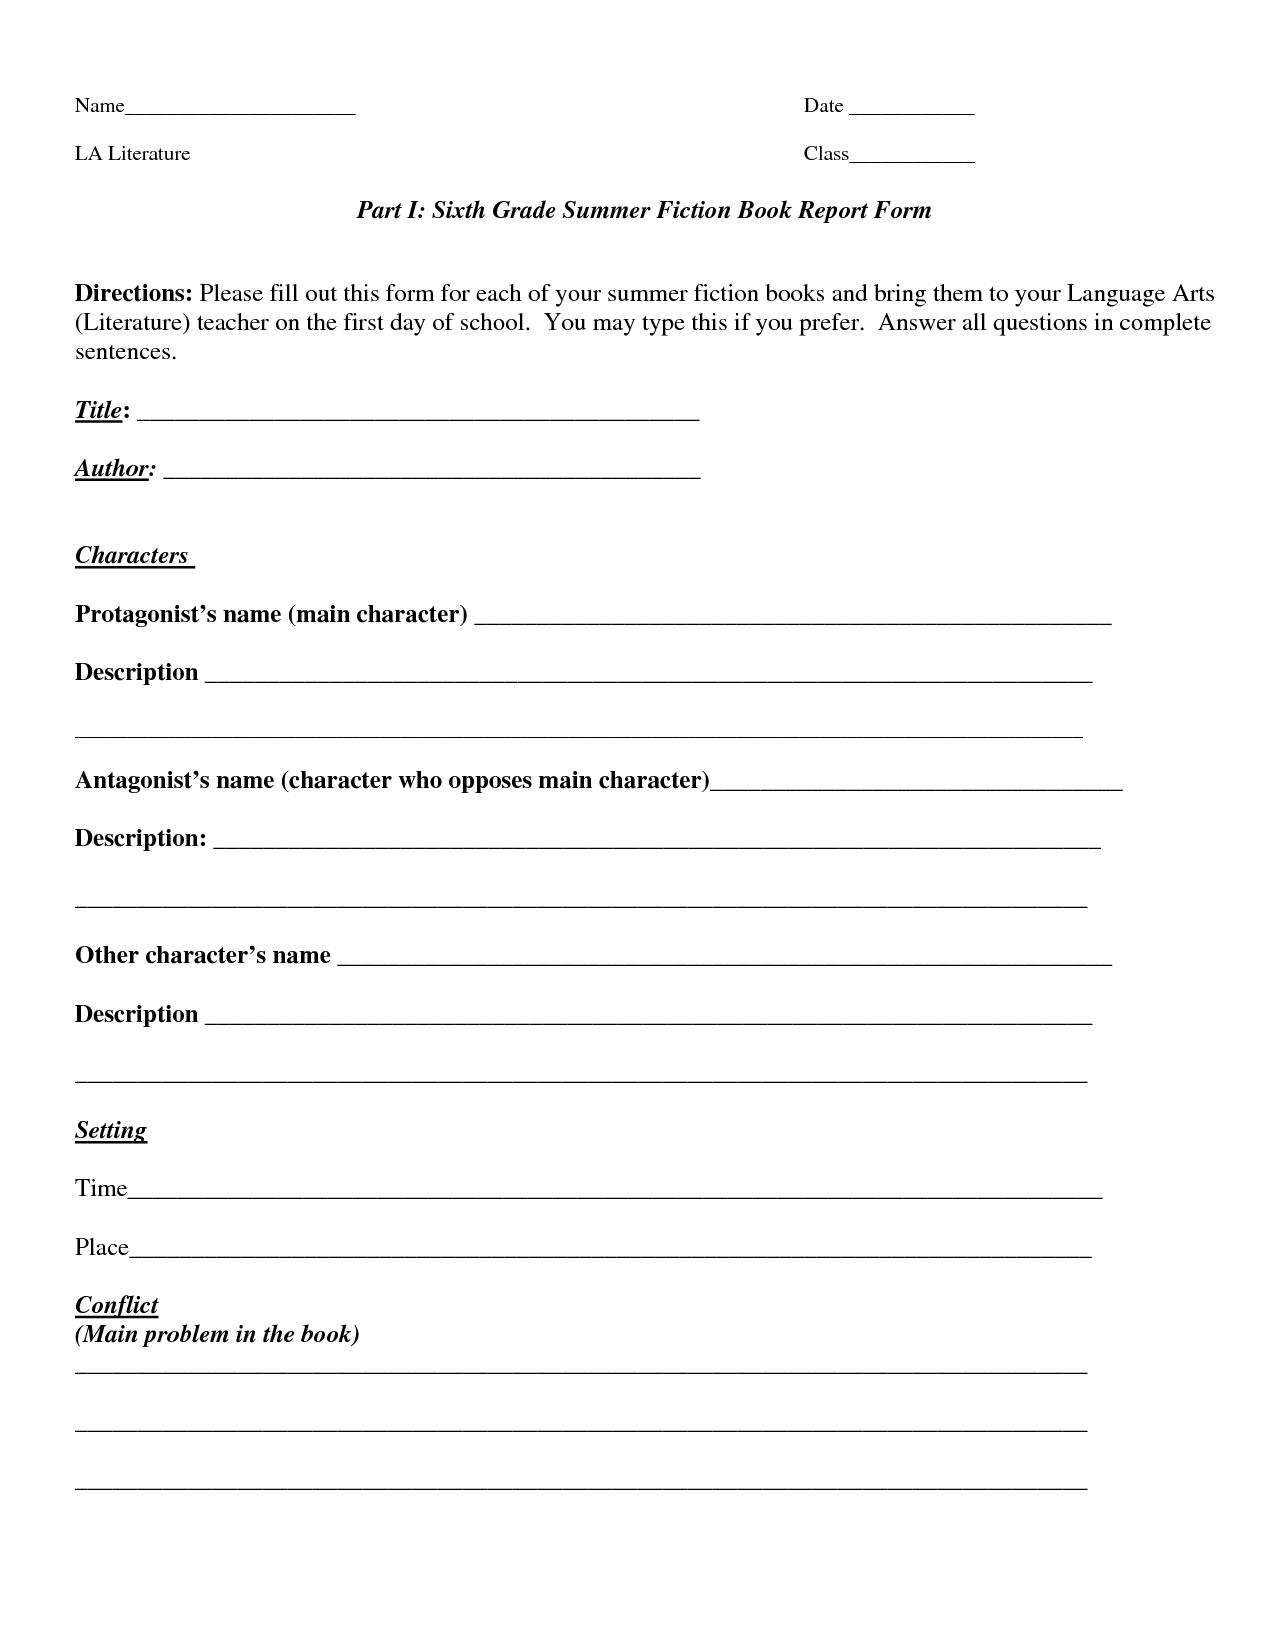 Book Report Template | Part I Sixth Grade Summer Fiction Inside 6Th Grade Book Report Template